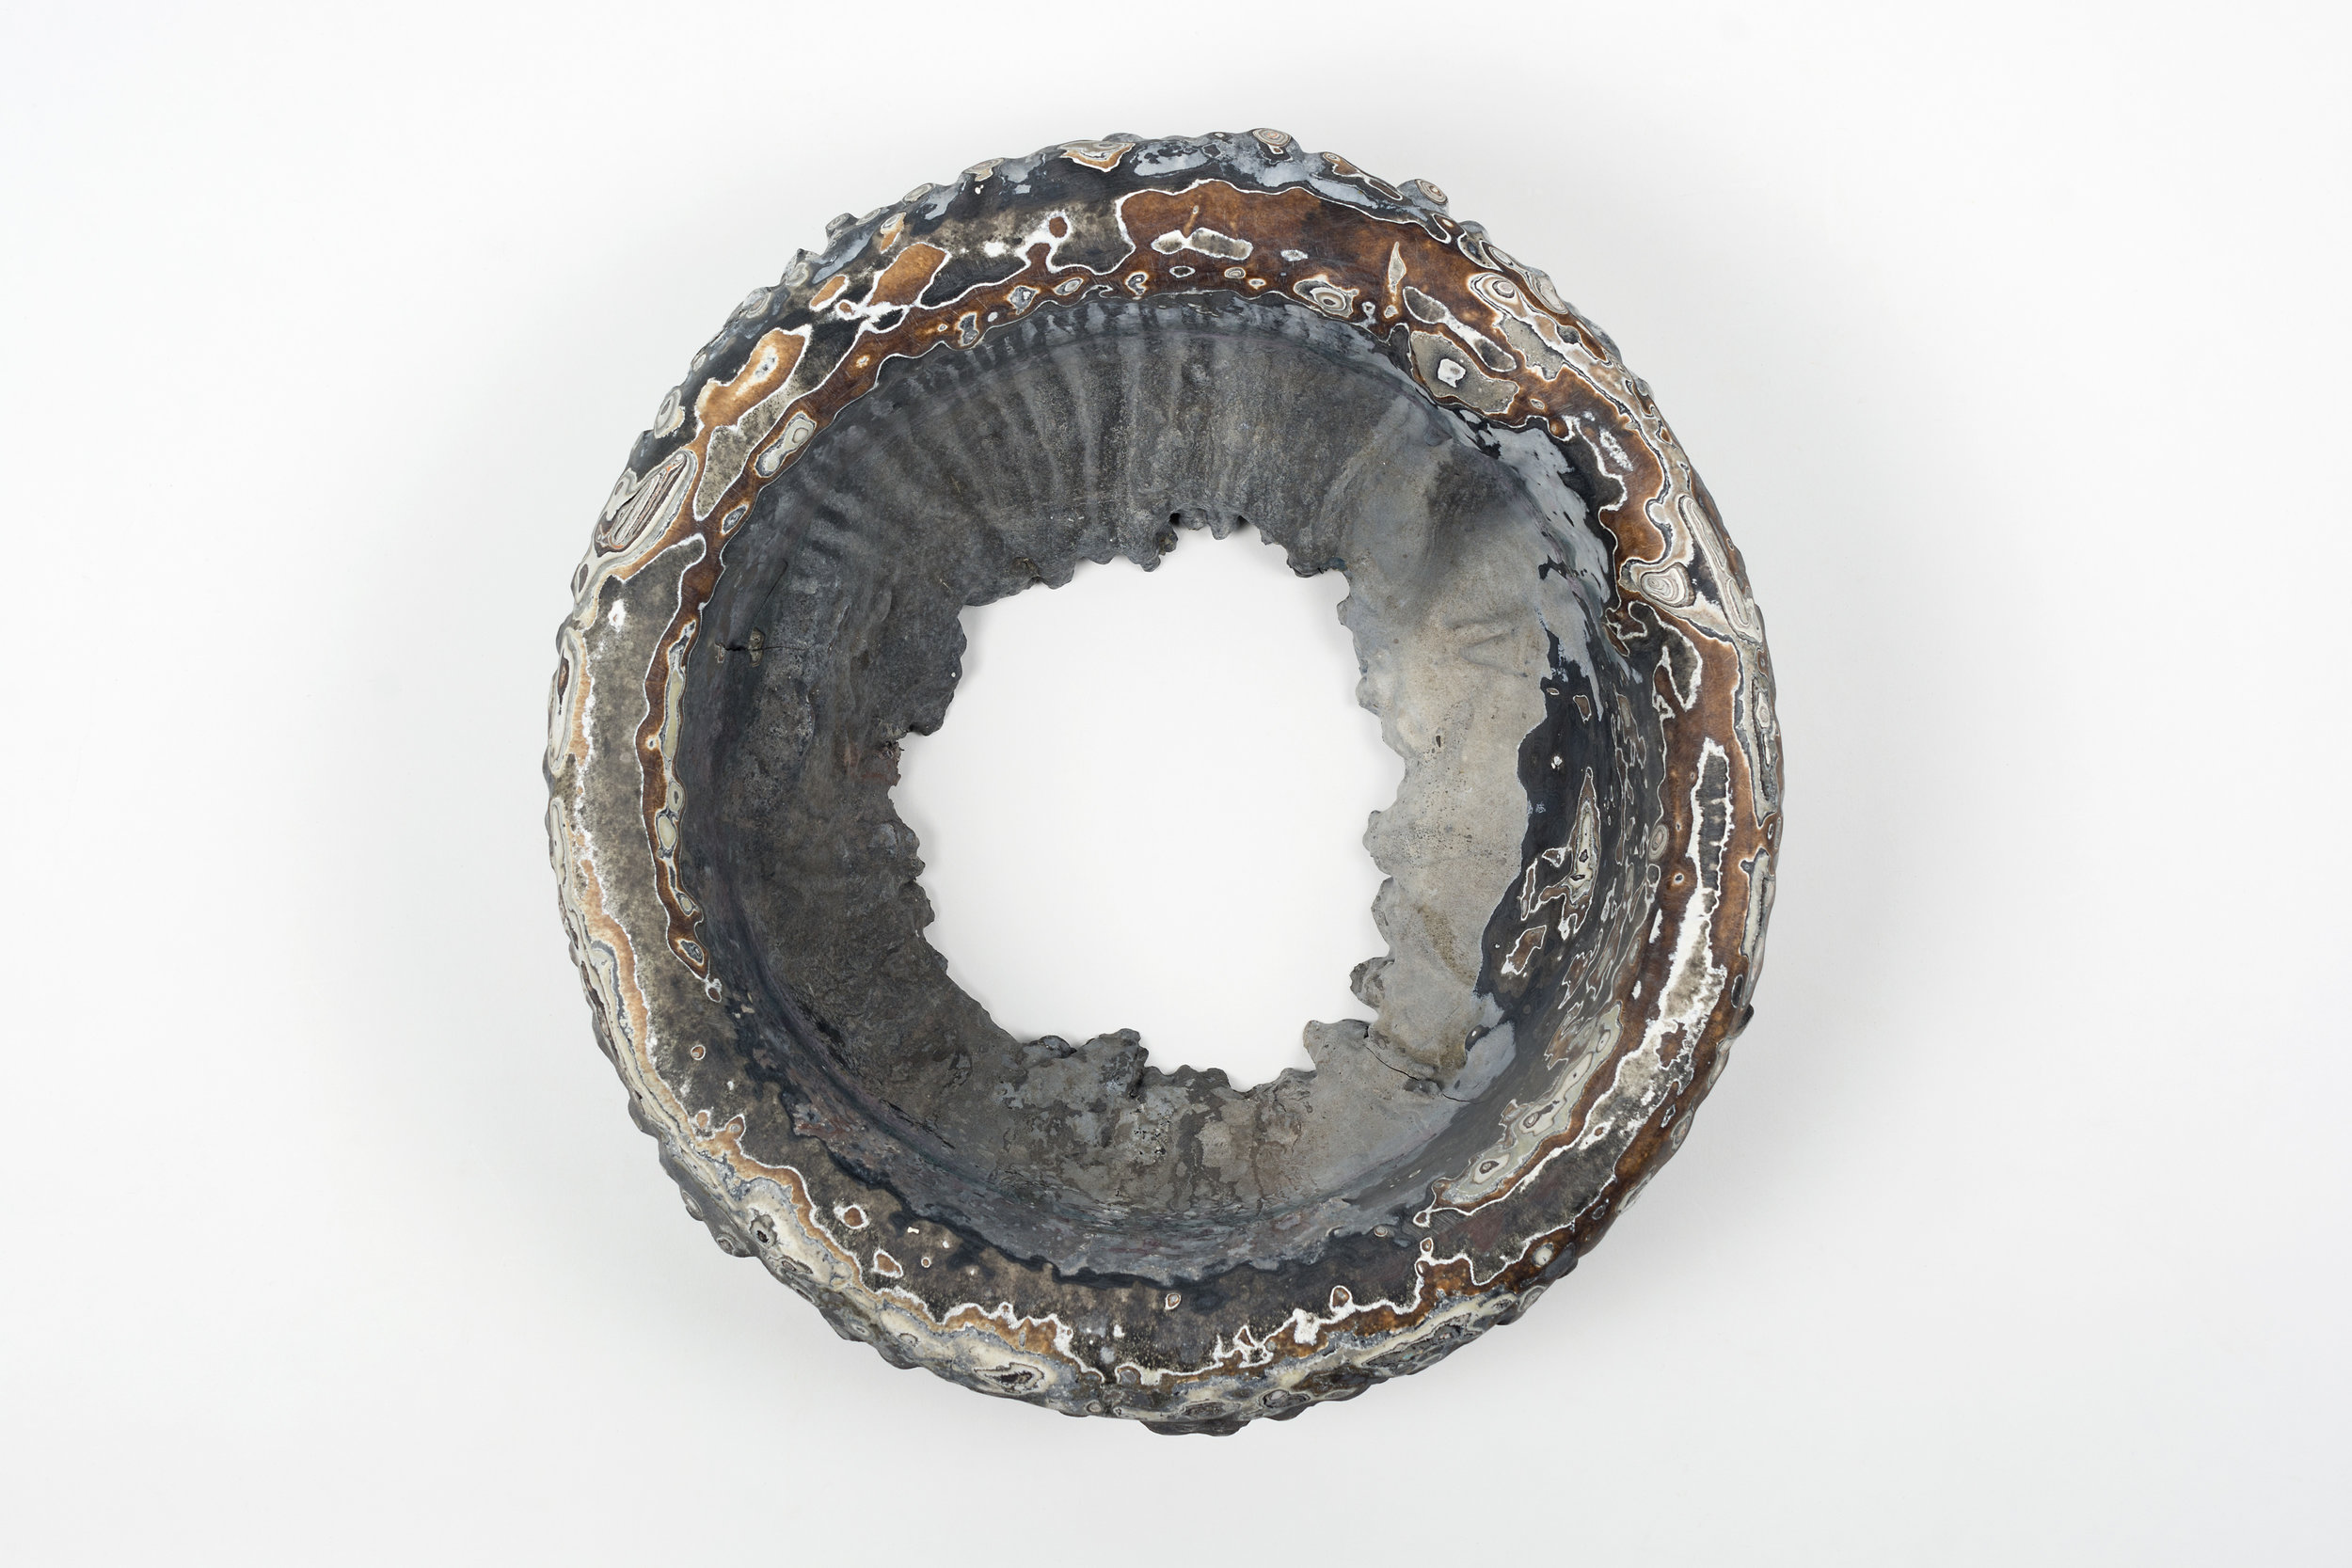 Nick DePirro,  Chapeau, 2015, motor agate, 13 x 13 x 8 inches.